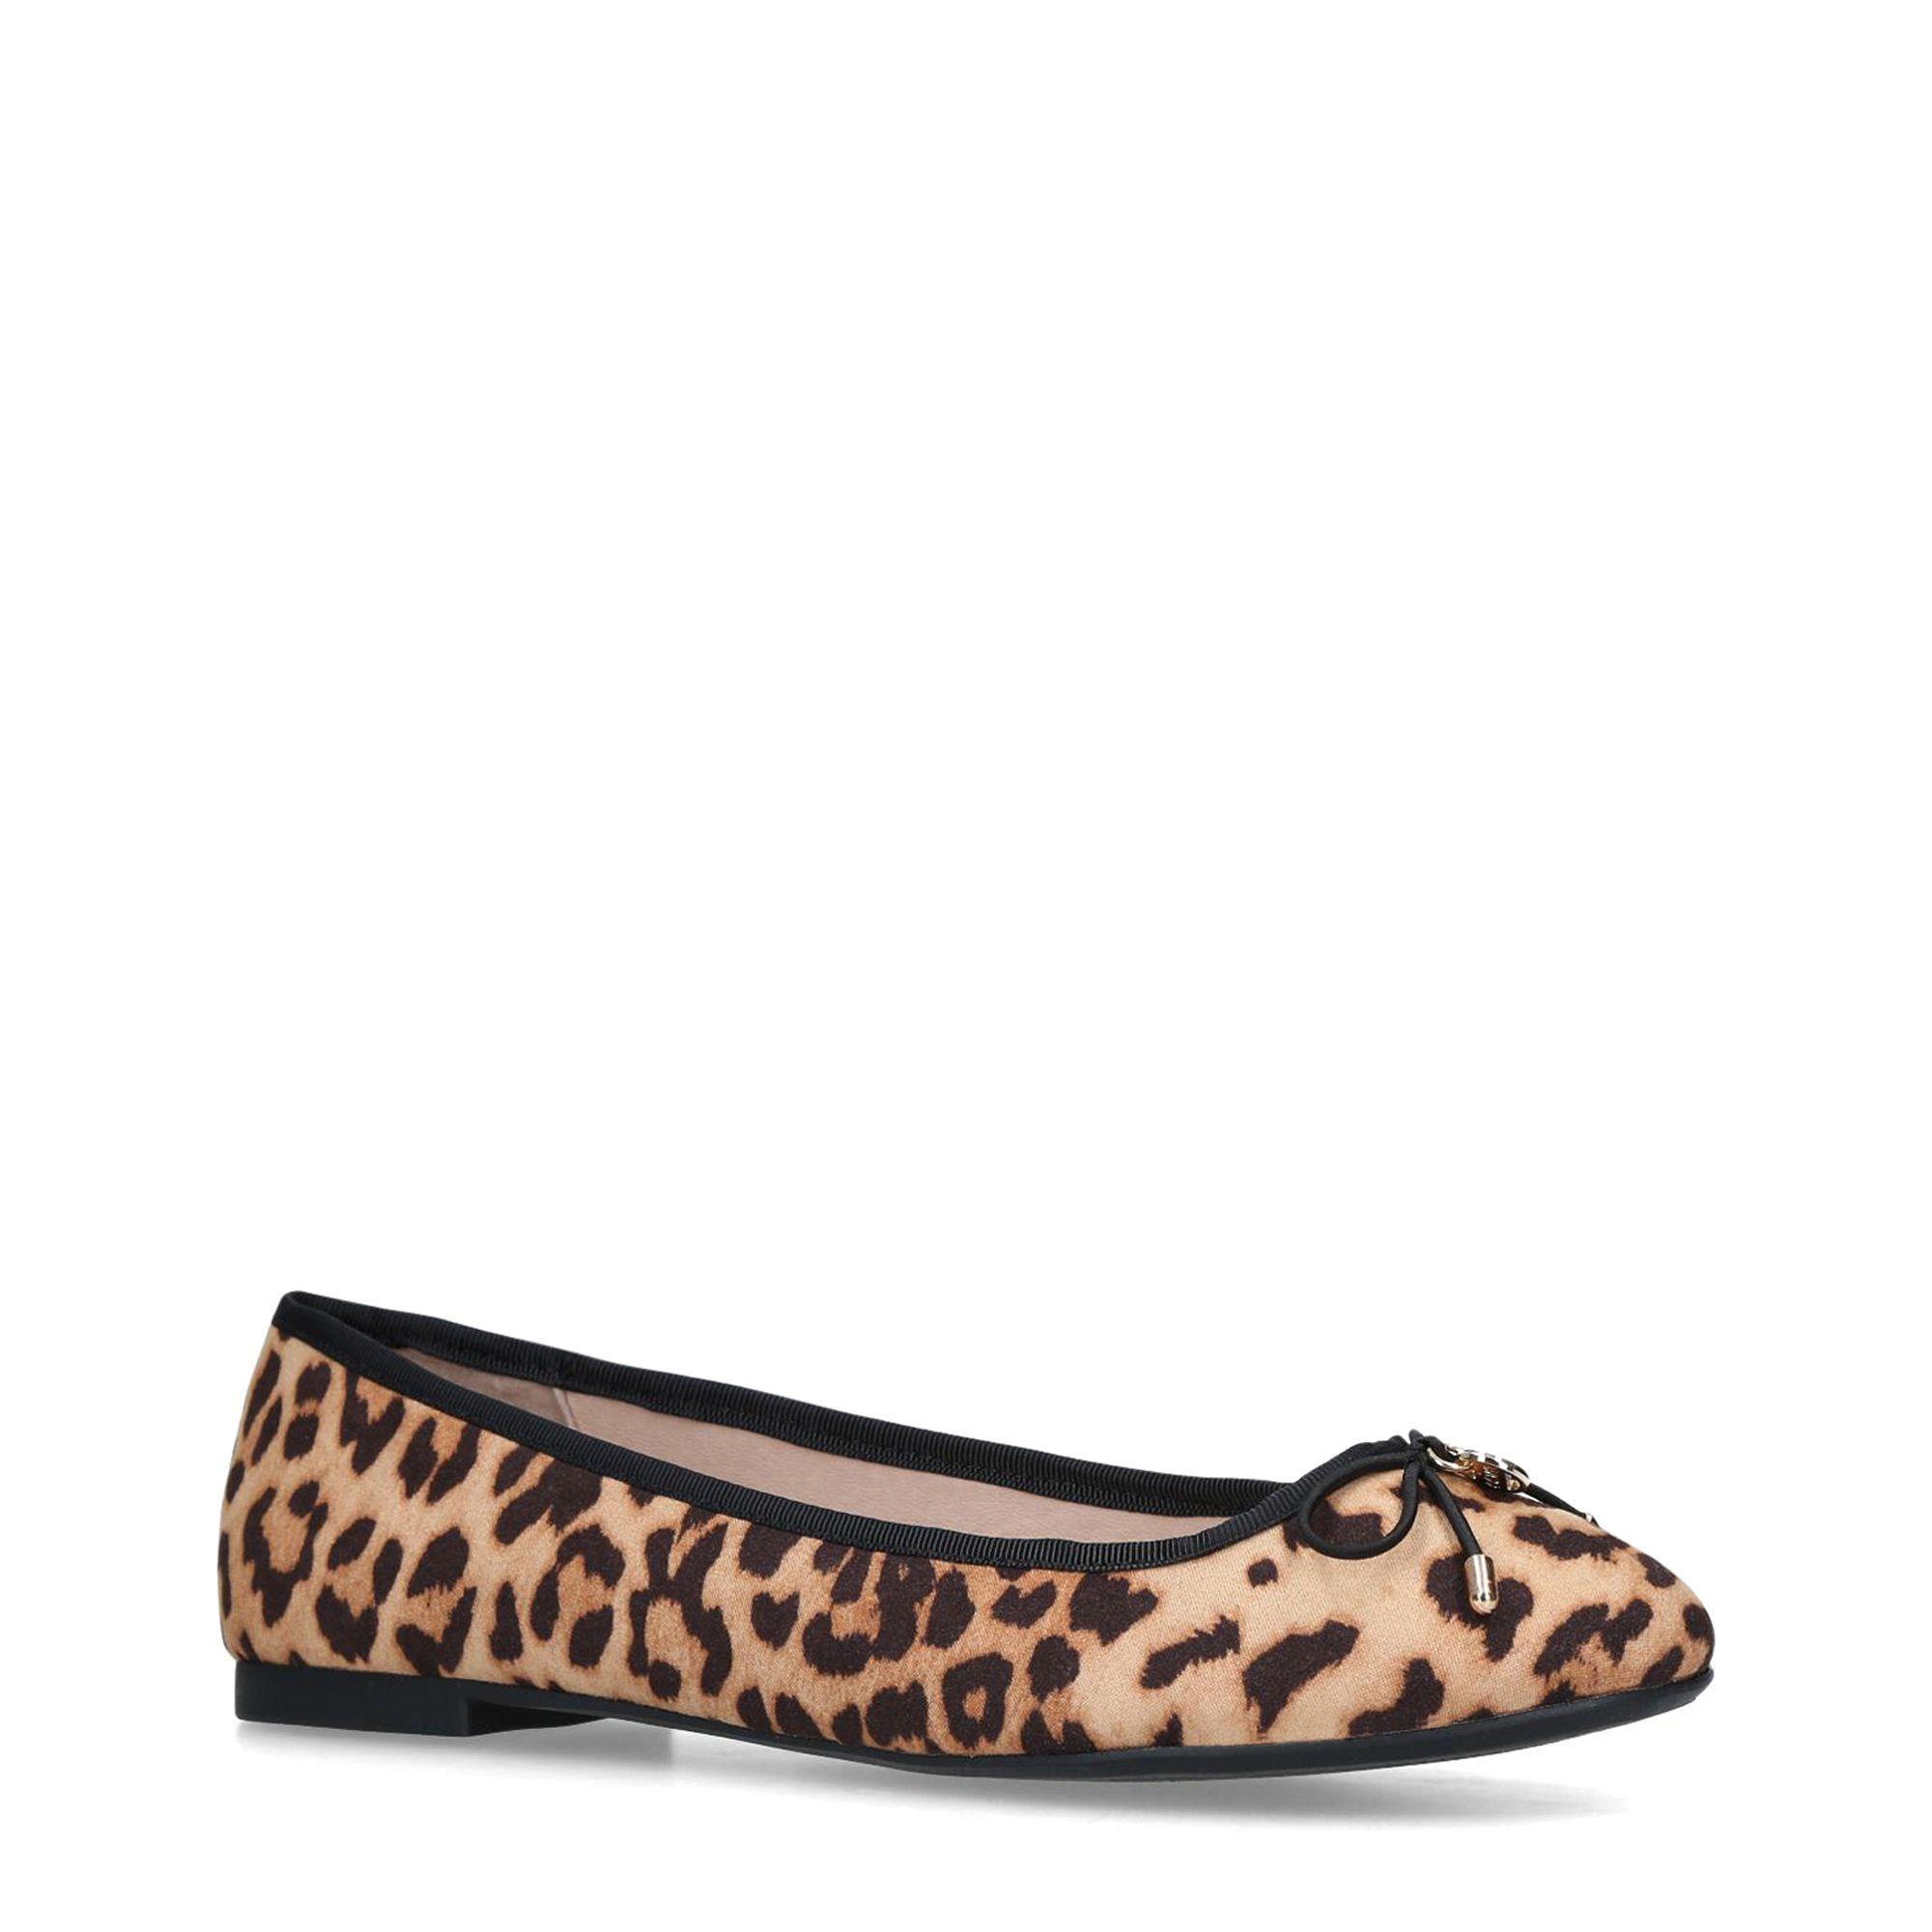 9f5bfa1a8 Miss Kg. Women s Brown Leopard  nelson  Print Ballerina Court Shoes